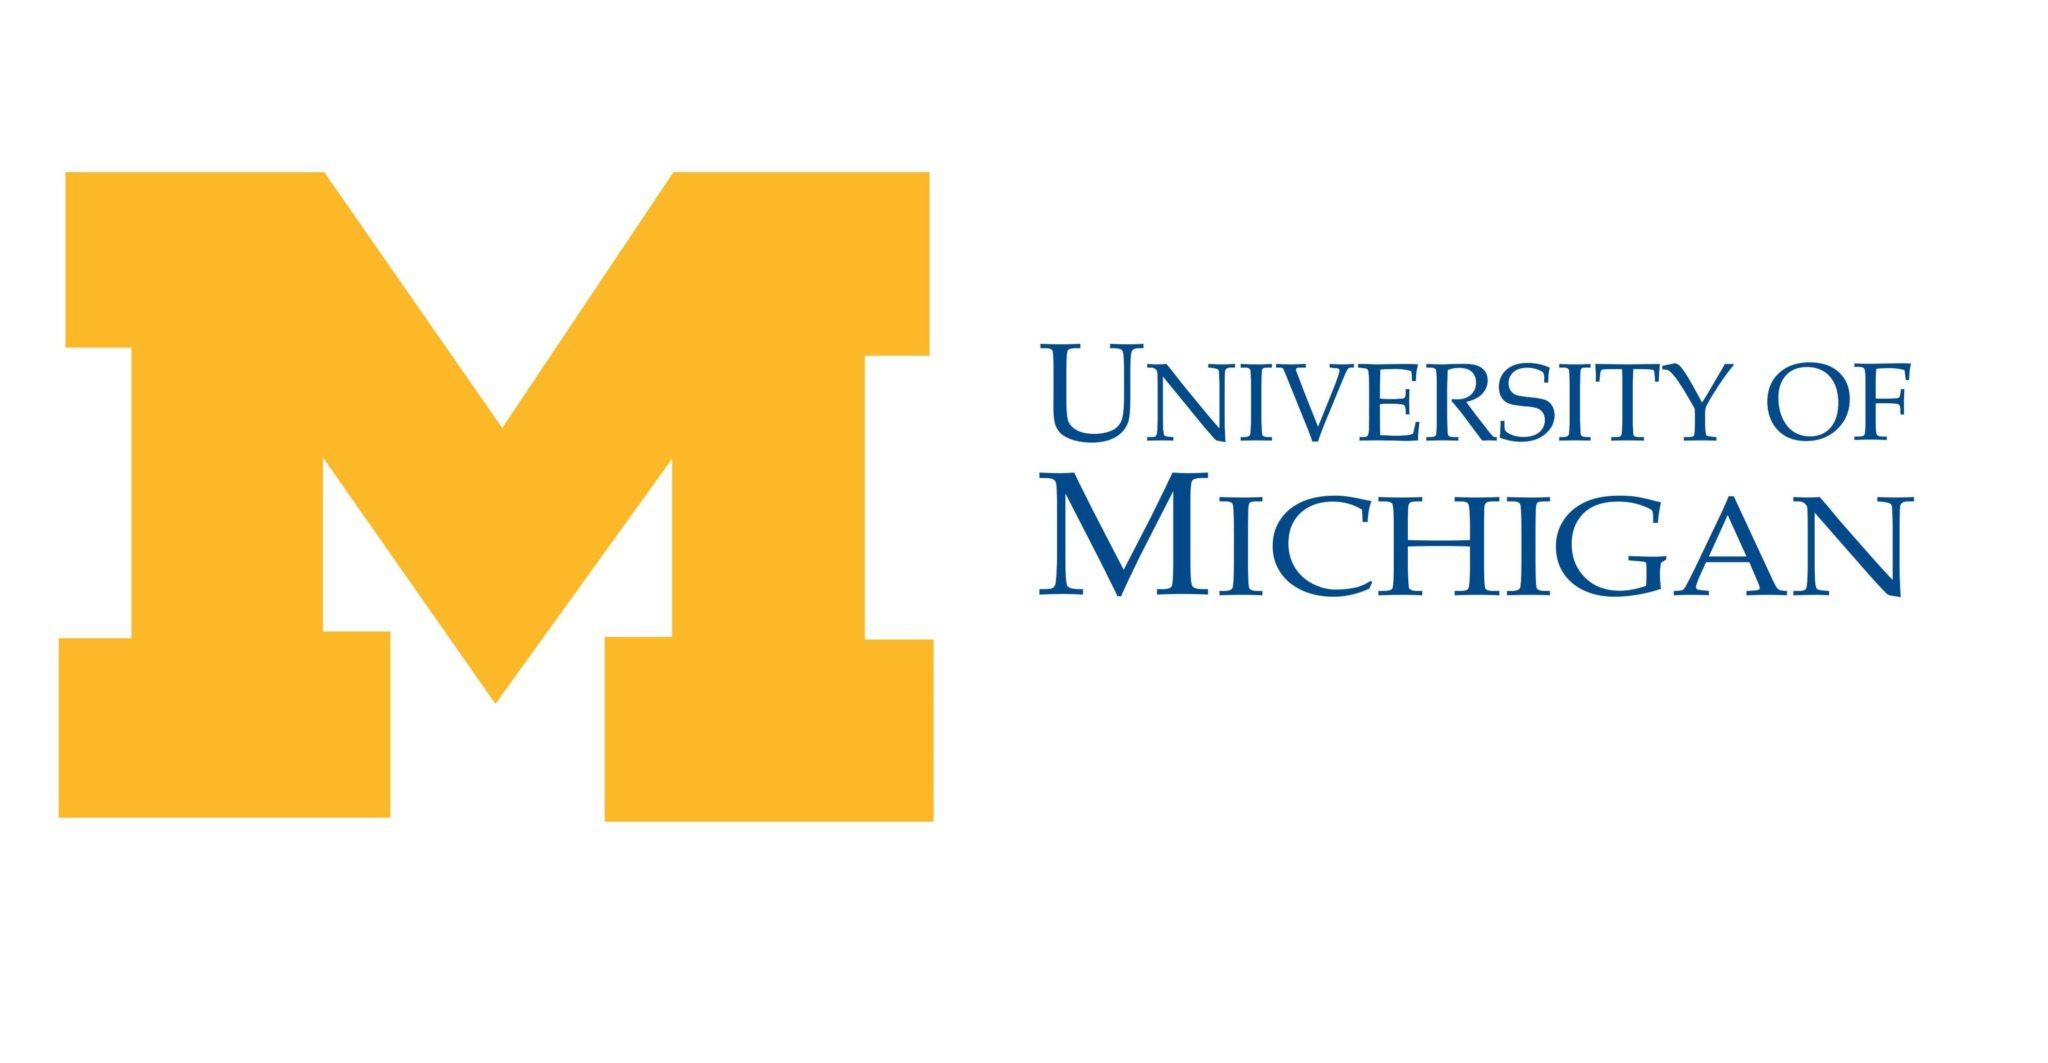 University of Michigan Undergraduate Program in Data Science